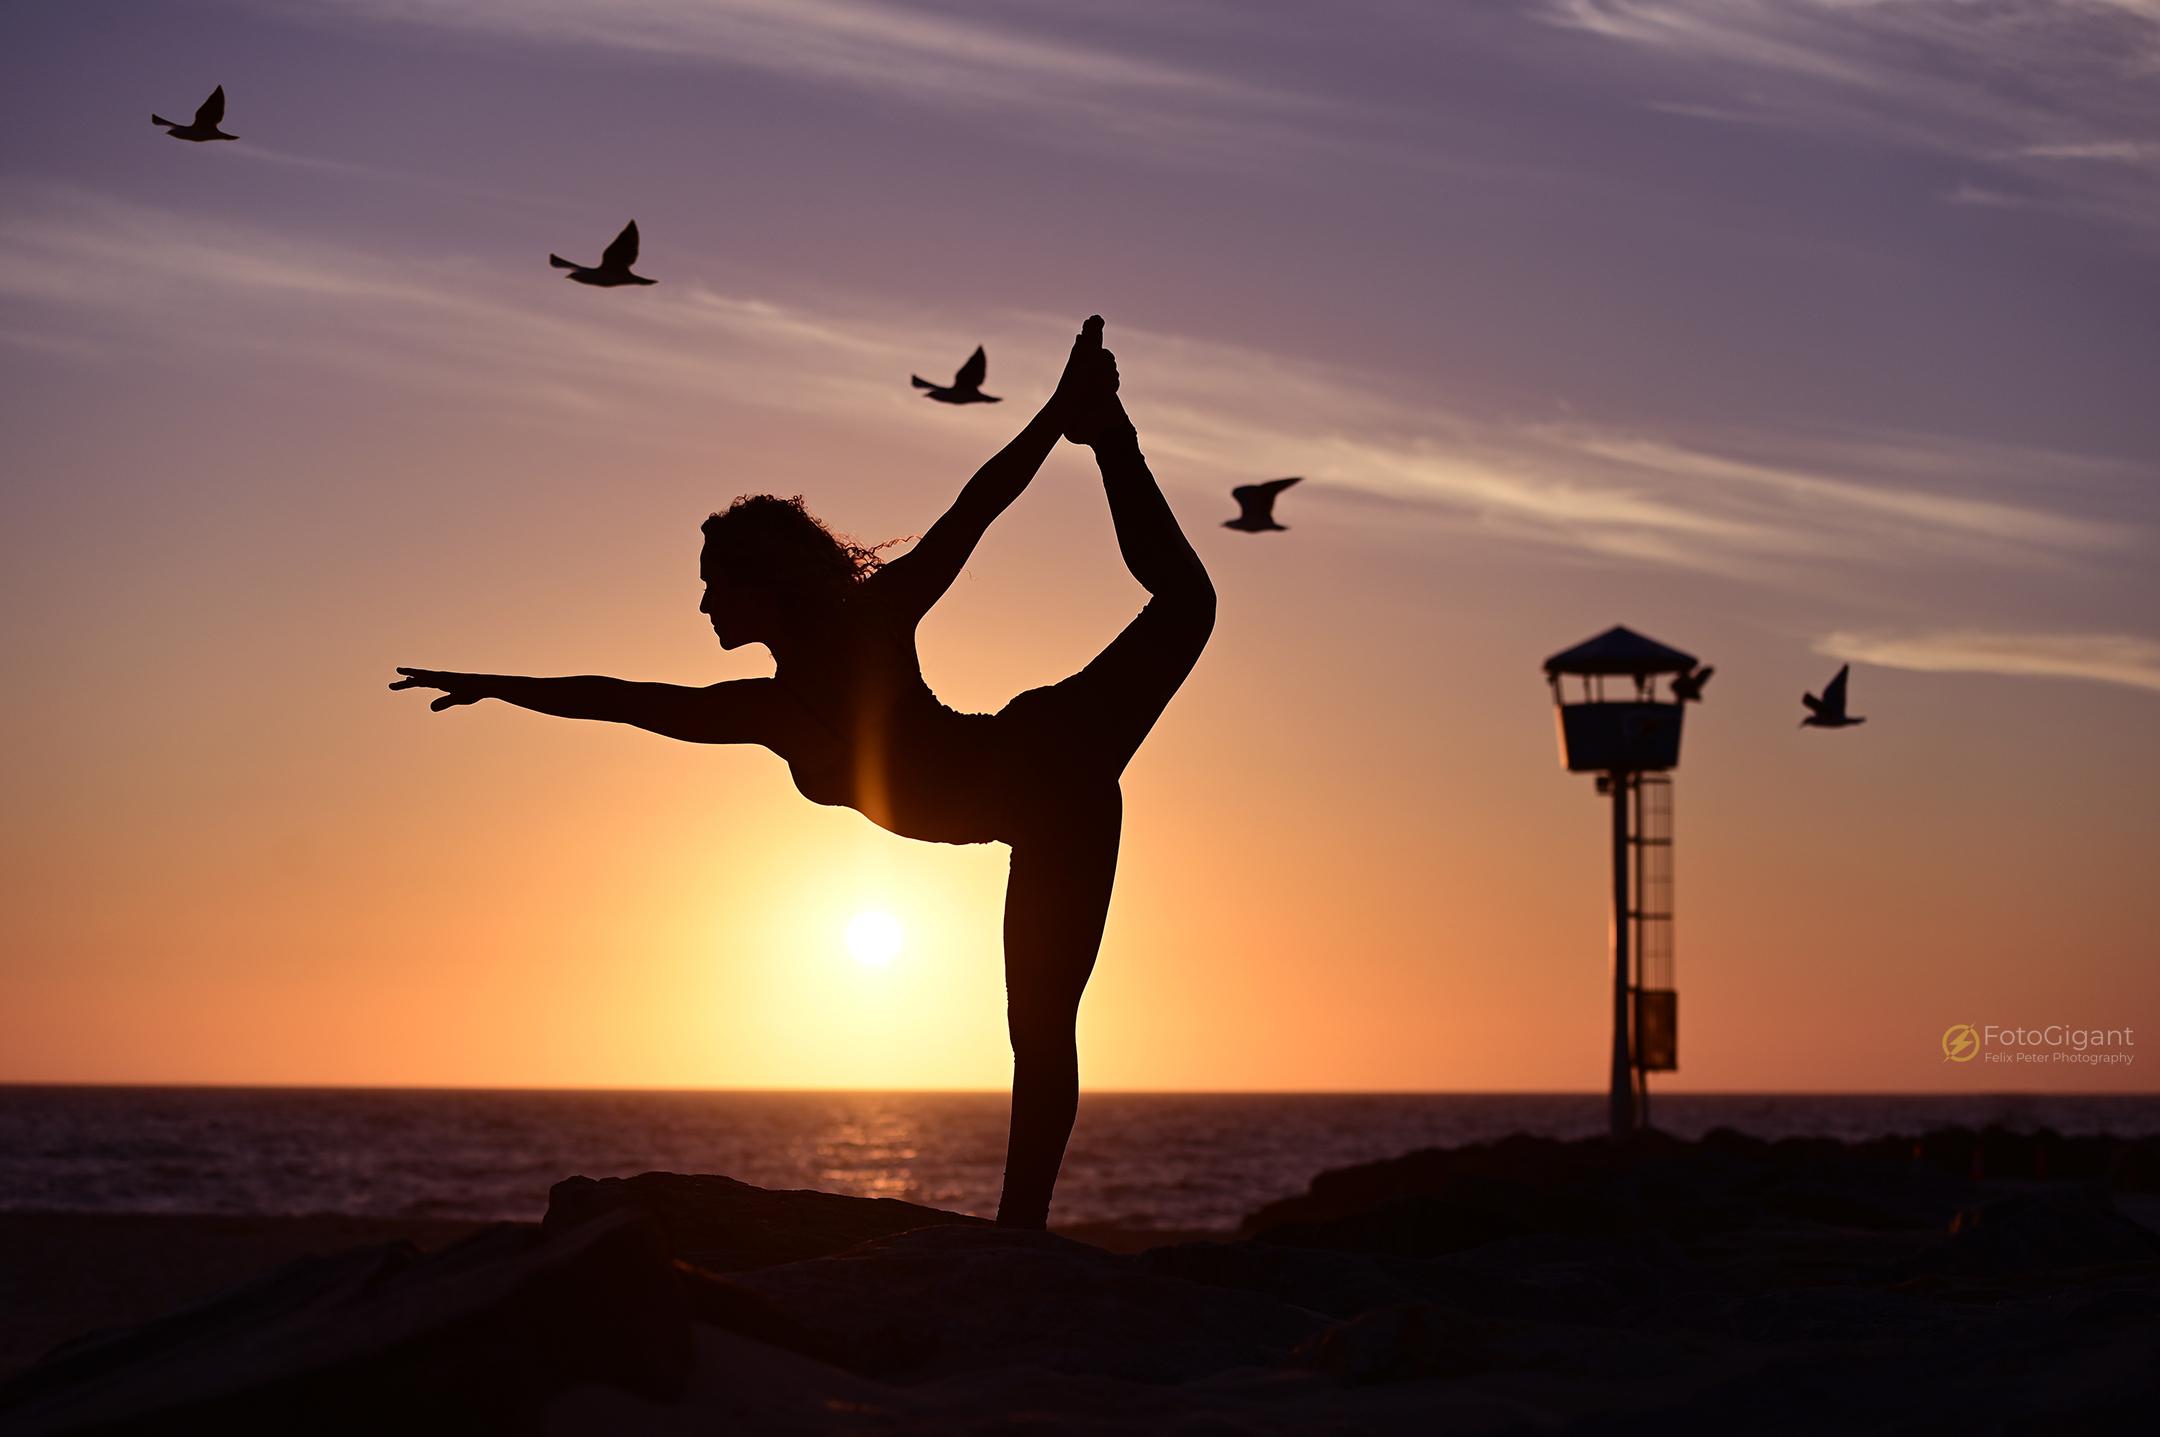 Pilates_Yoga_Silhouettes_05.jpg